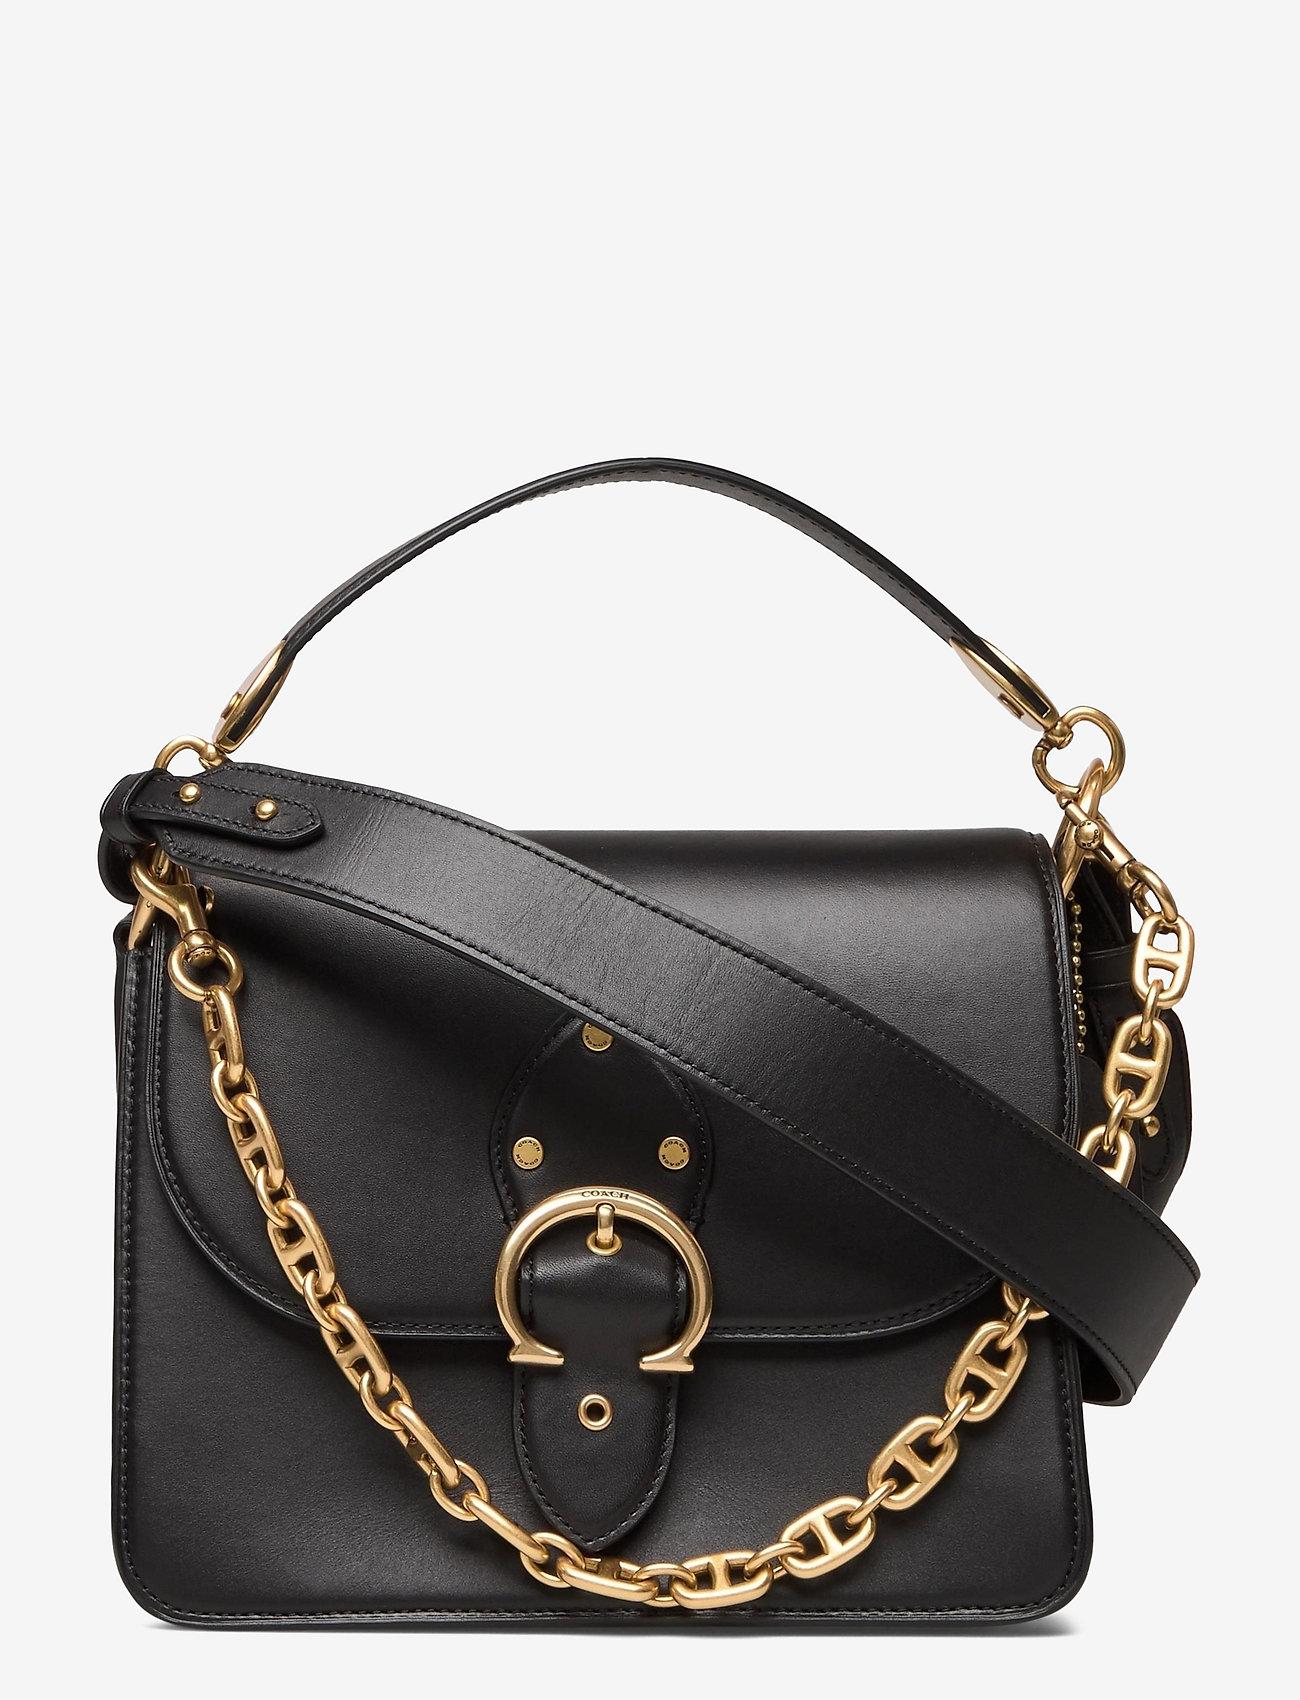 Coach - BEAT SHOULDER BAG Leather Womens Bags - väskor - black - 0